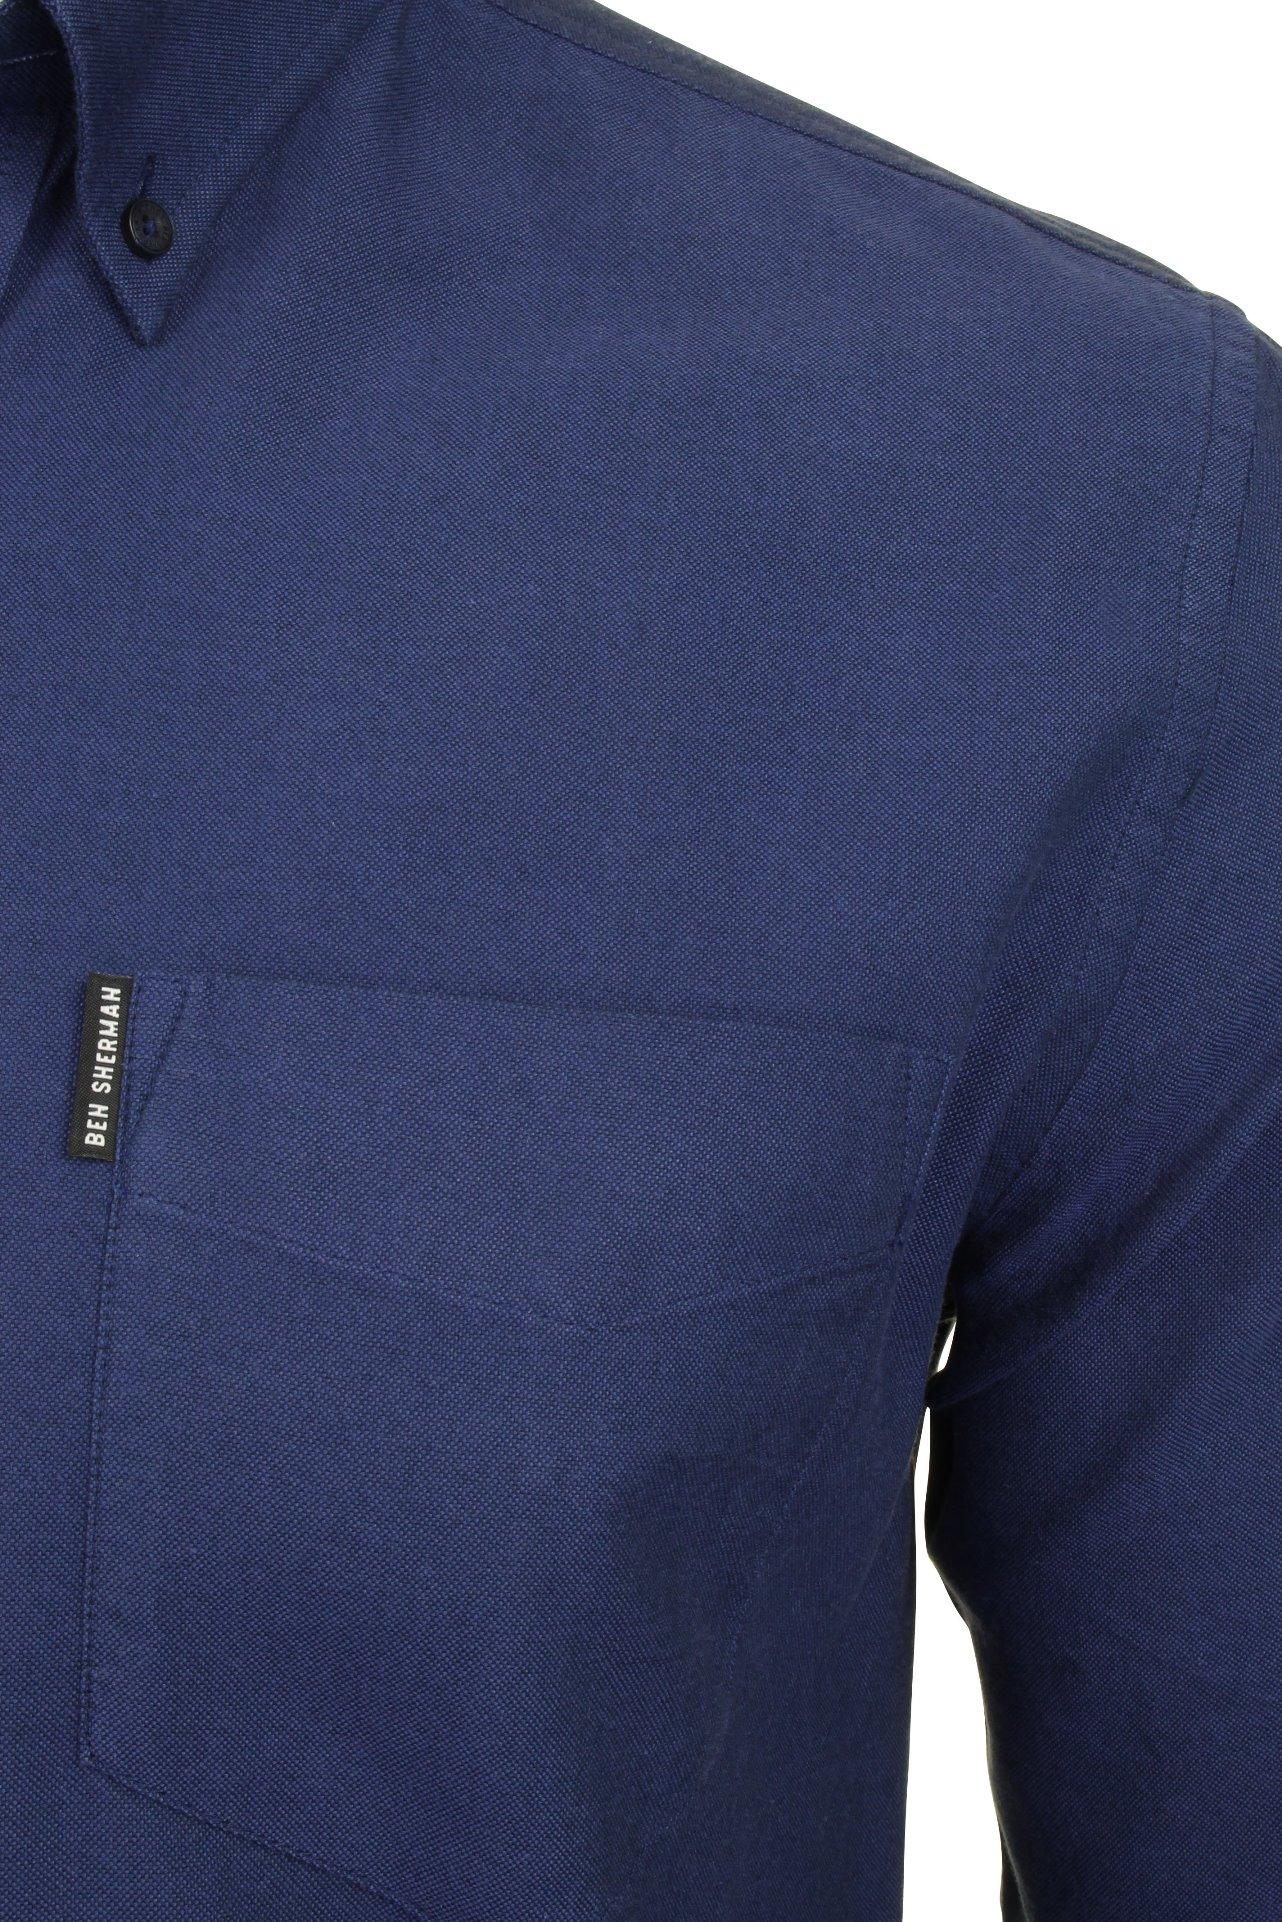 Ben-Sherman-Long-Sleeved-039-Oxford-039-Shirt thumbnail 10